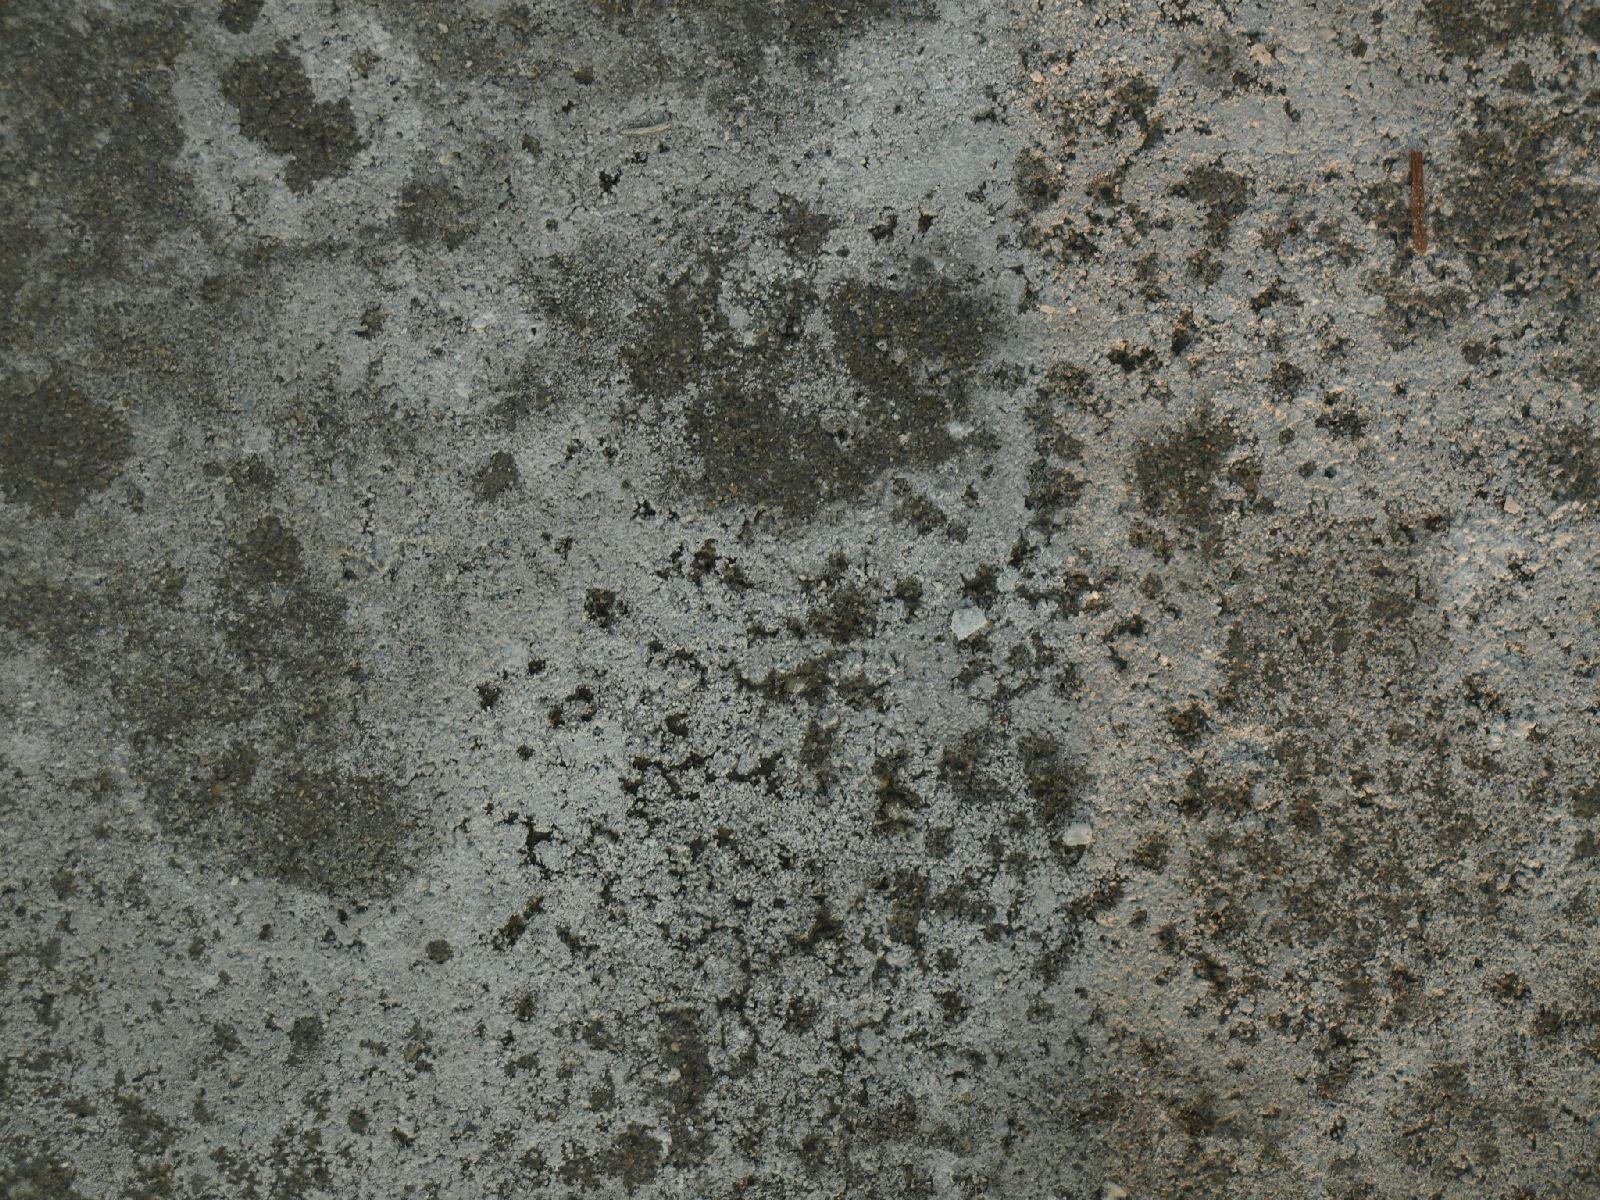 Snow_Texture_A_P1109053